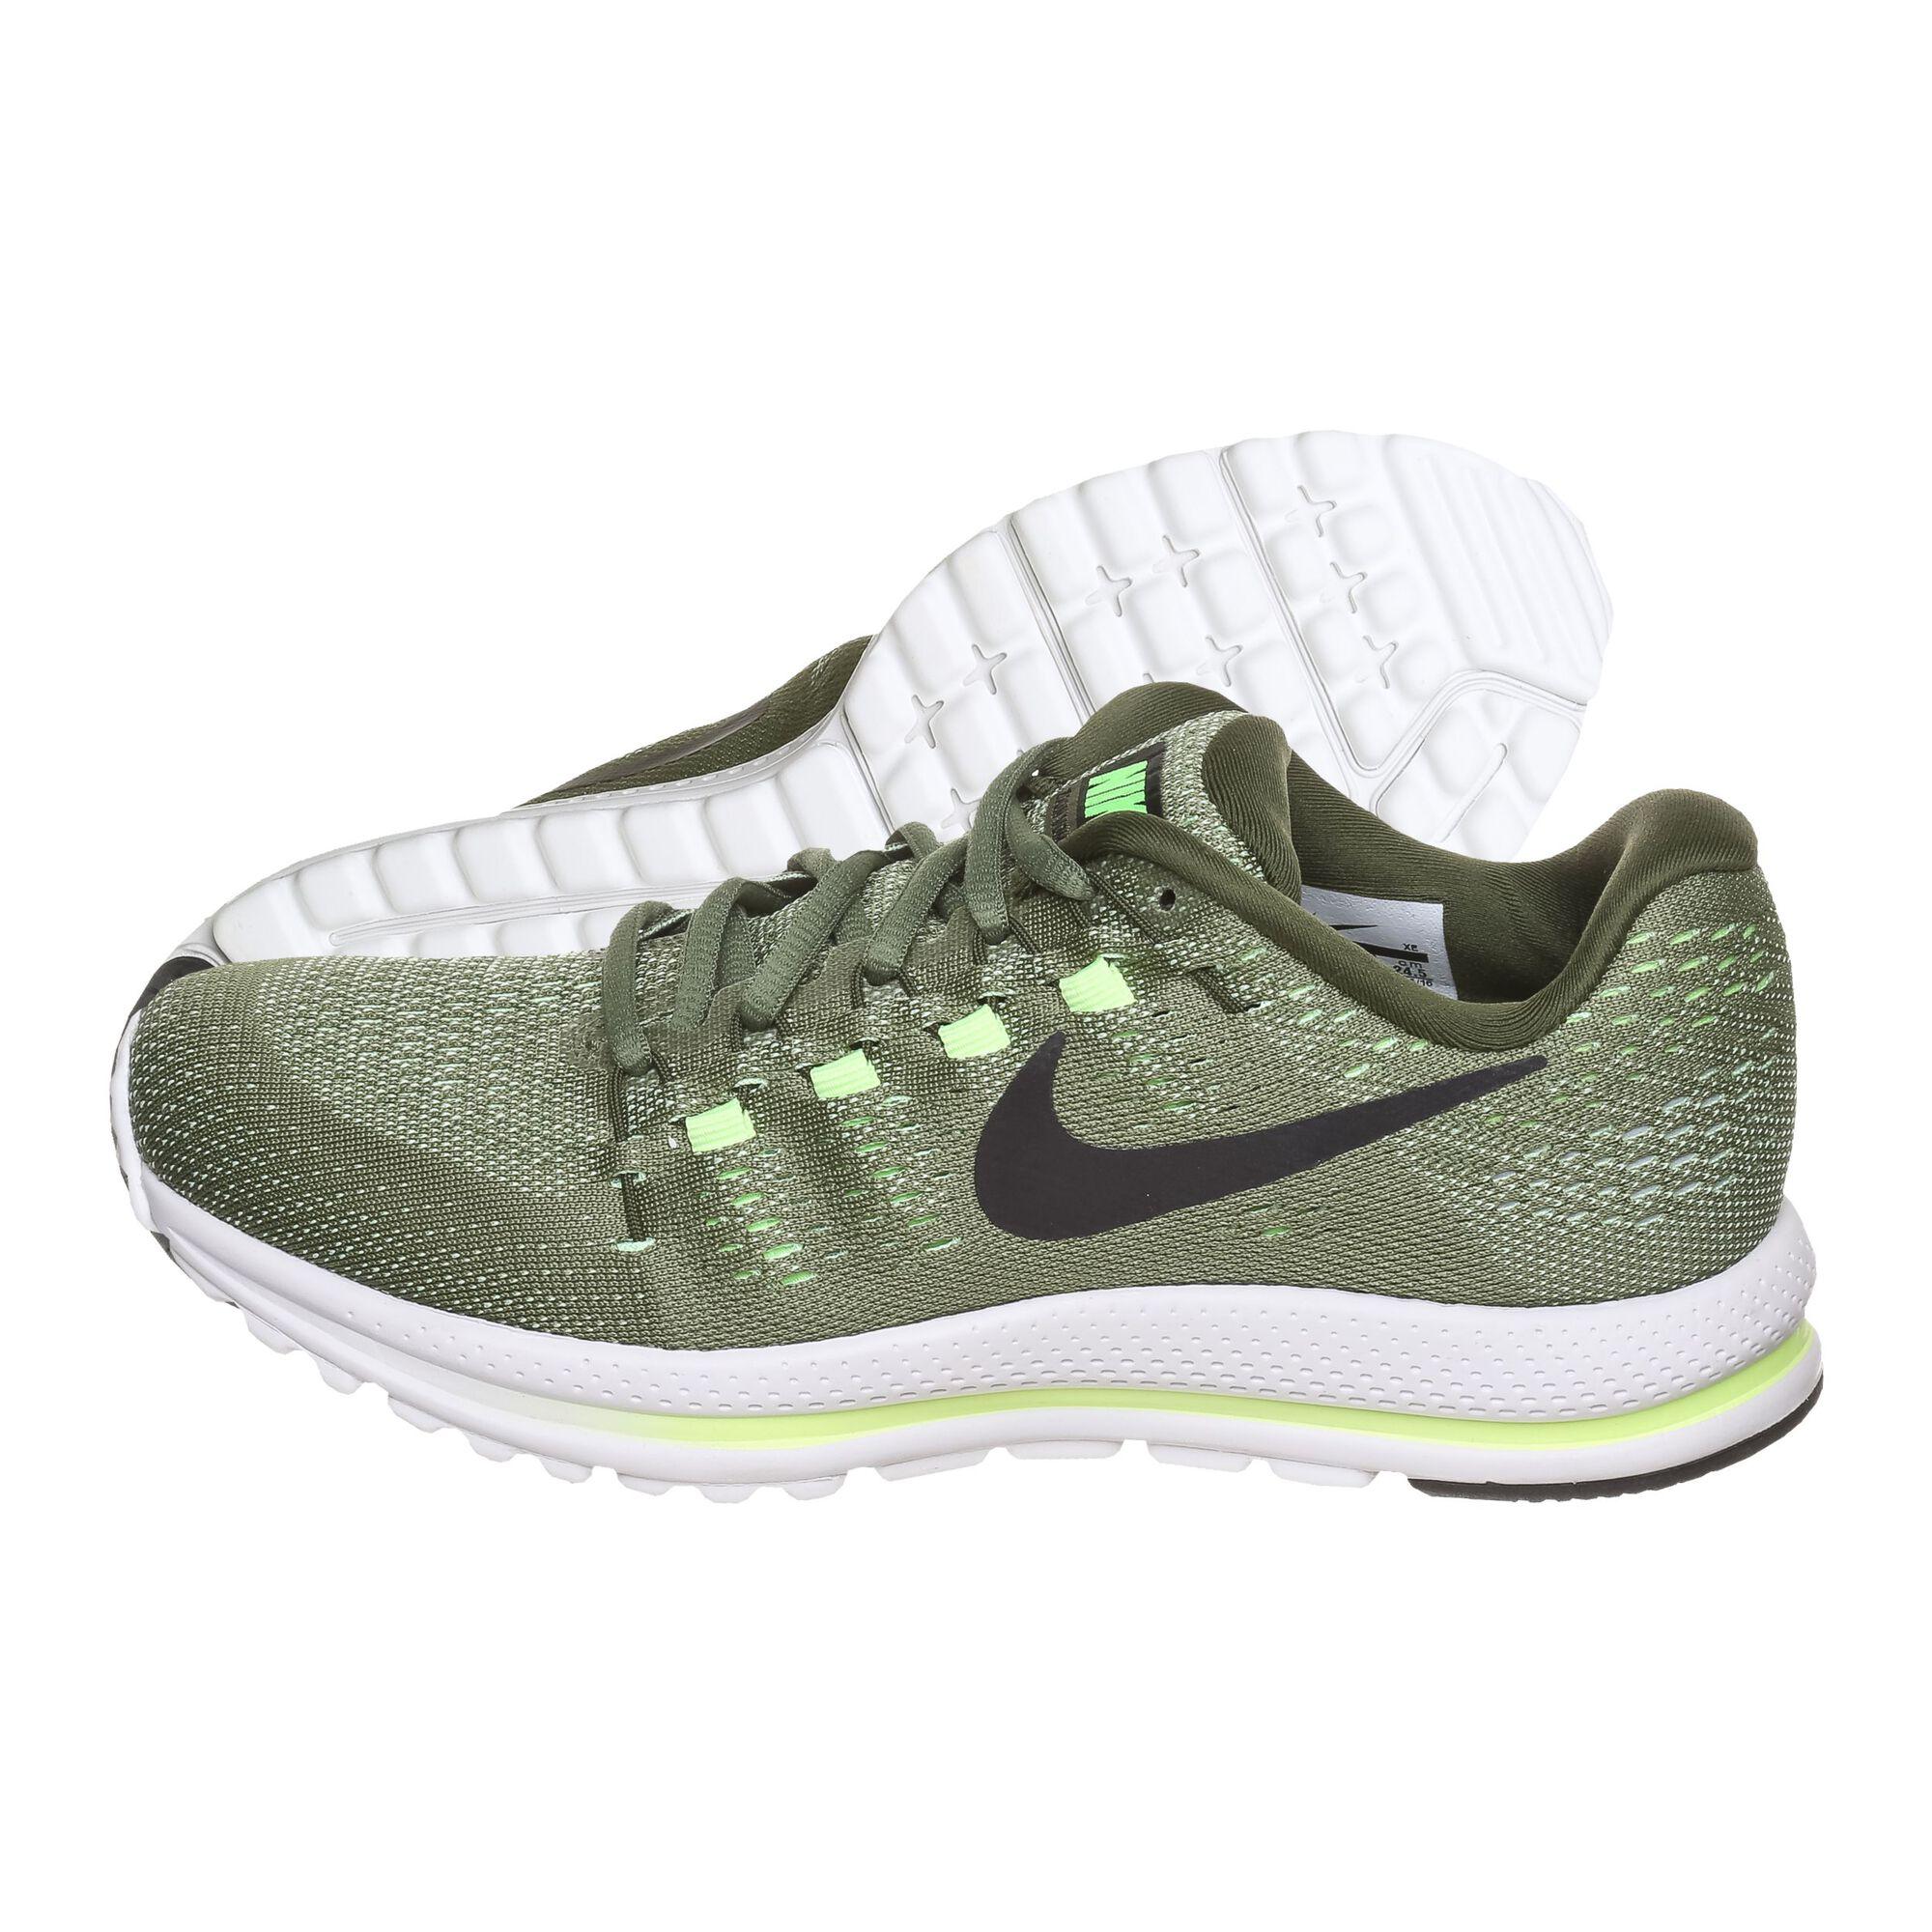 66d93f24b661 buy Nike Air Zoom Vomero 12 Neutral Running Shoe Women - Green ...